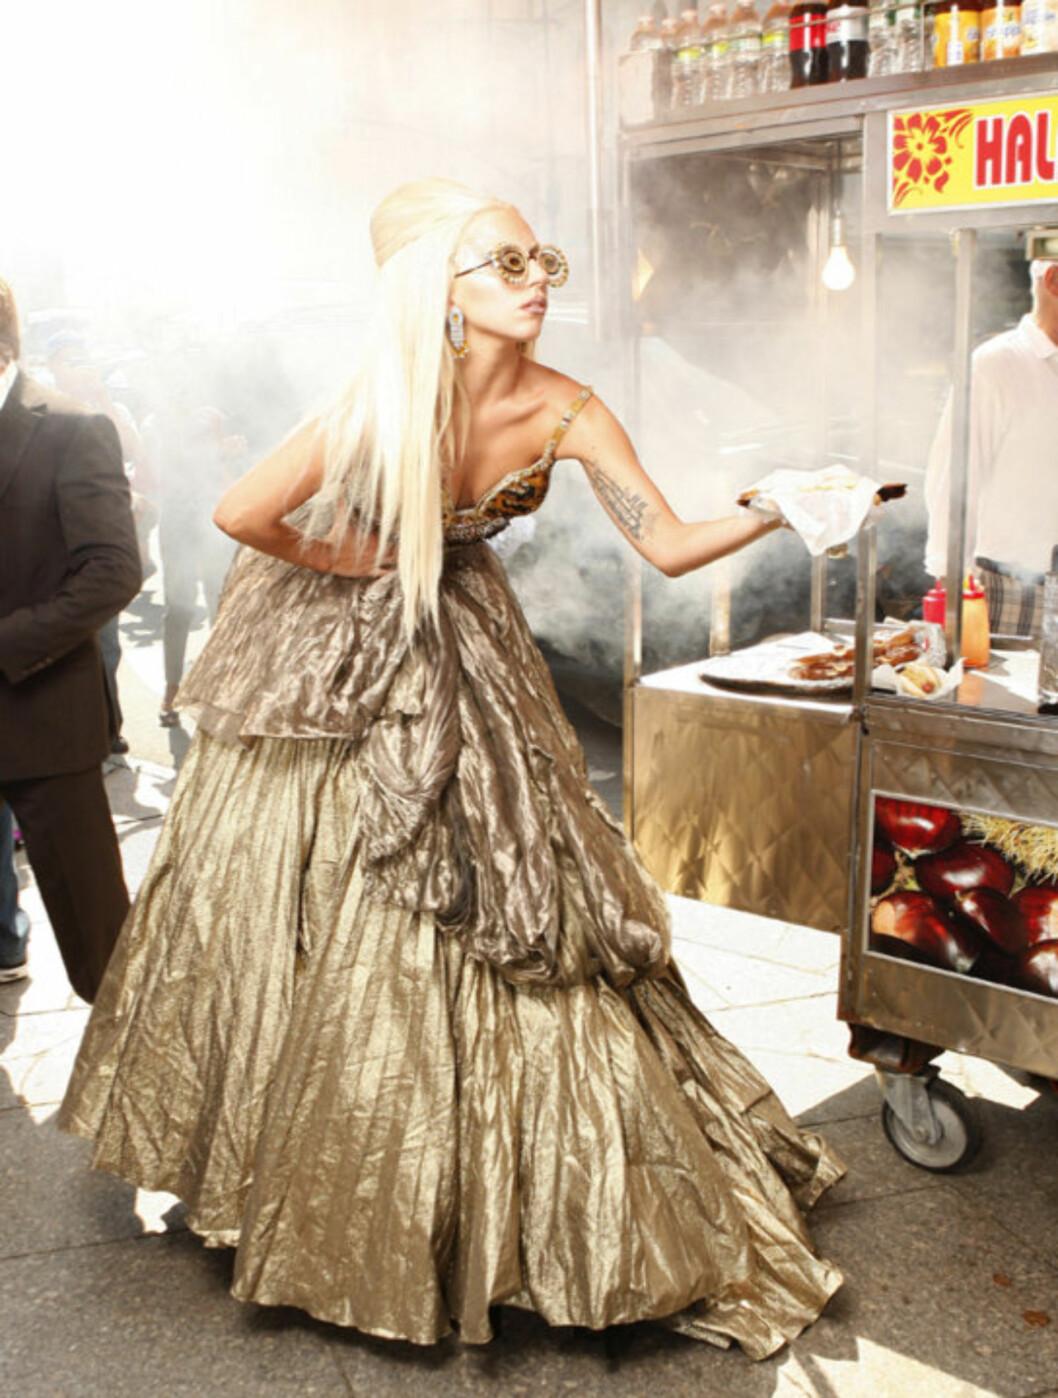 <strong>STILIG:</strong> Umulige antrekk kombinert med unaturlige positurer? Motereportasje i Vanity Fair, så klart! Lady Gaga «spiser» pølse i brød under fotograferingen. Foto: All Over Press